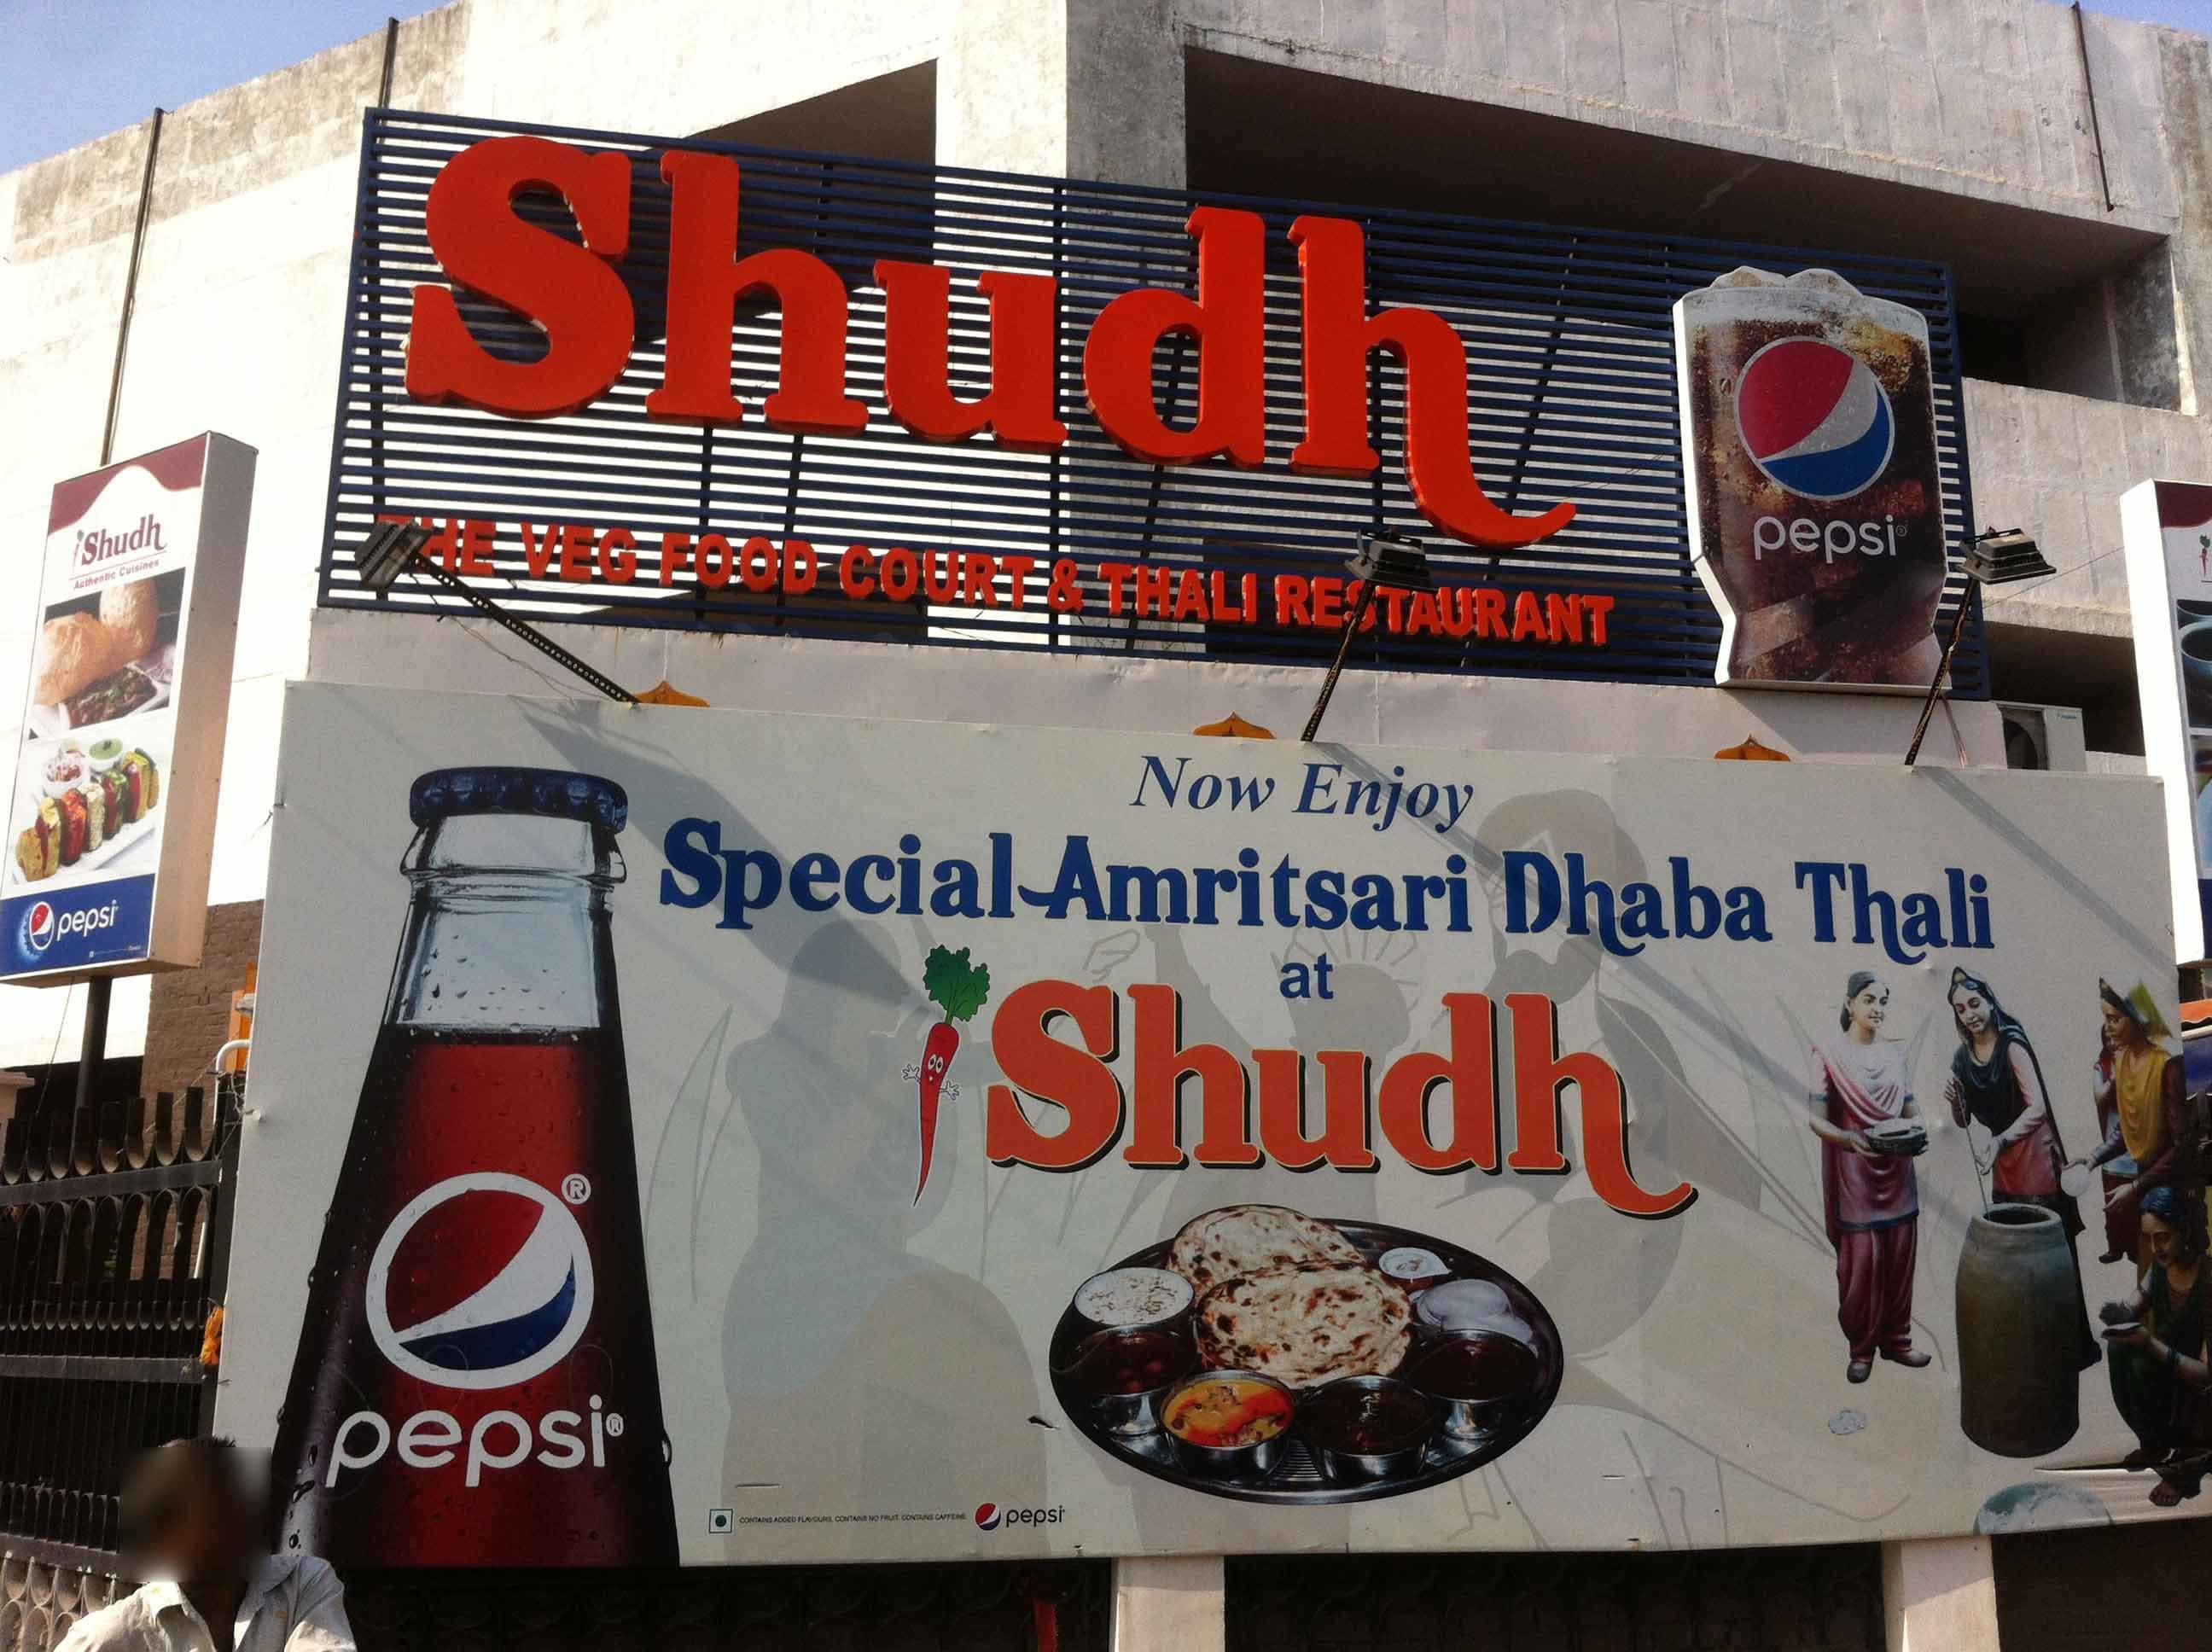 Shudh Restaurant - Town Hall - Amritsar Image